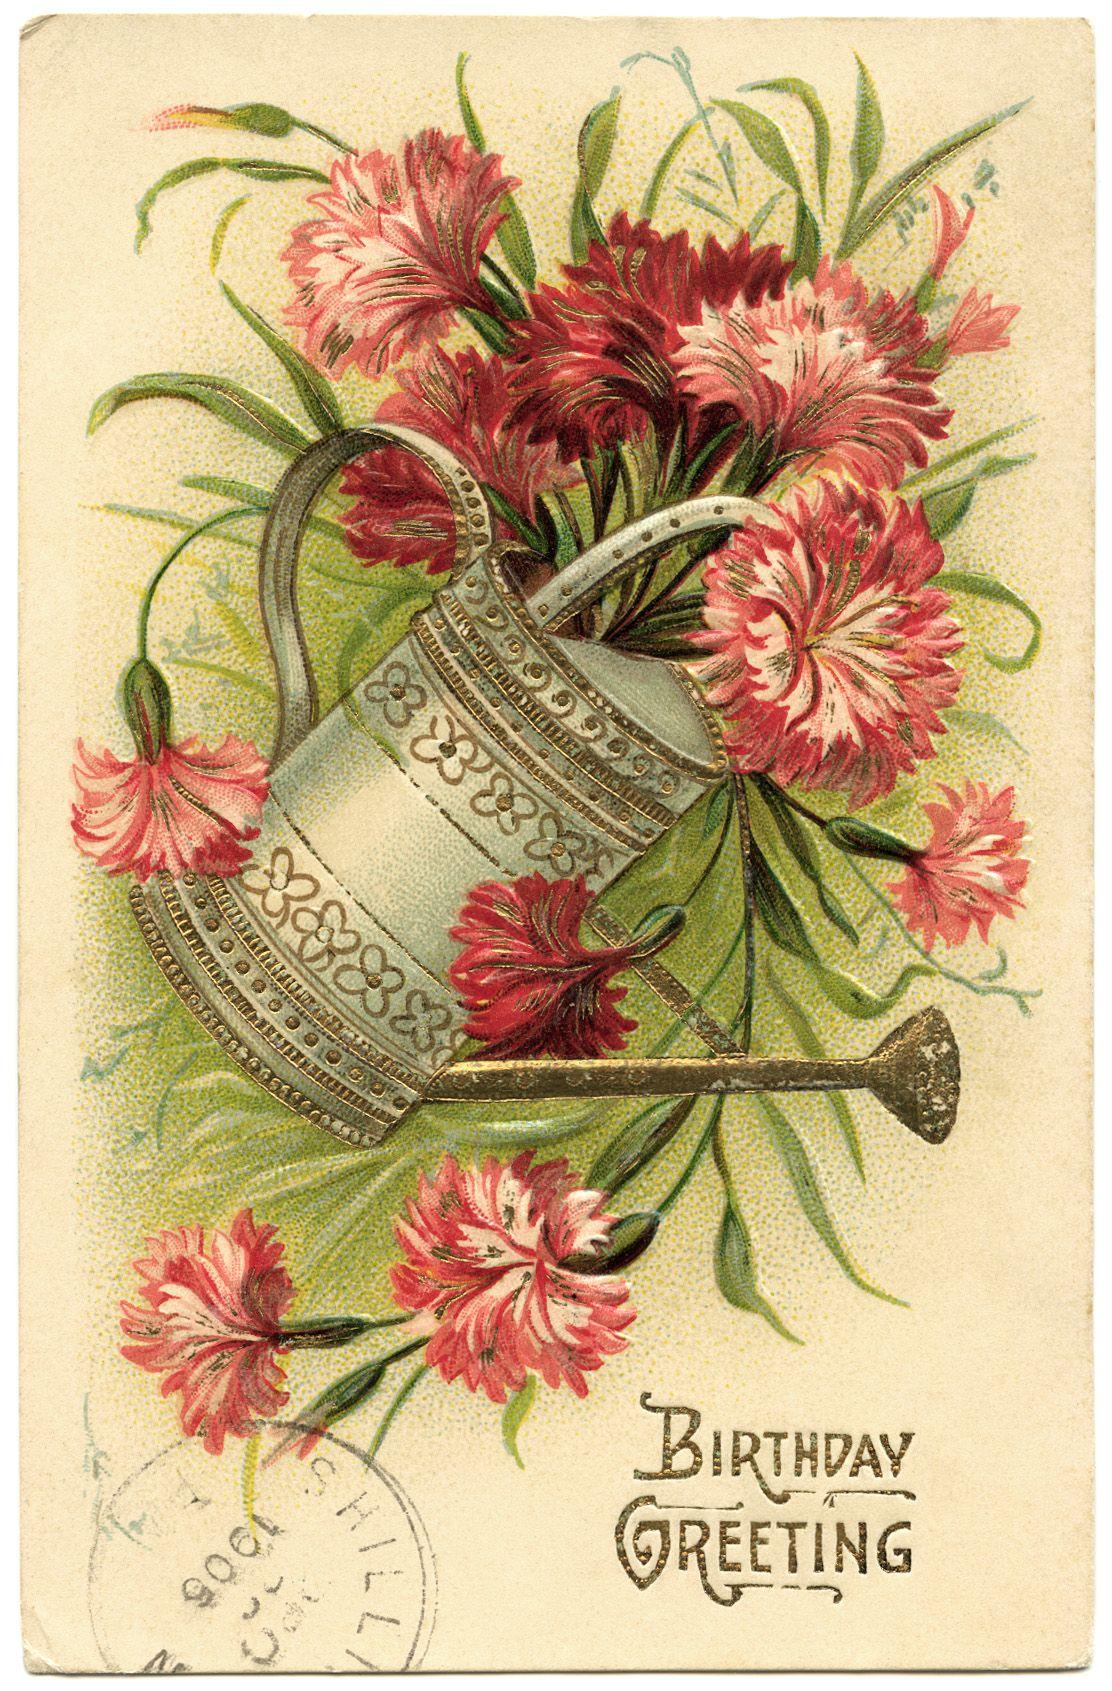 FREE Digital Image Vintage Birthday Greeting Postcard